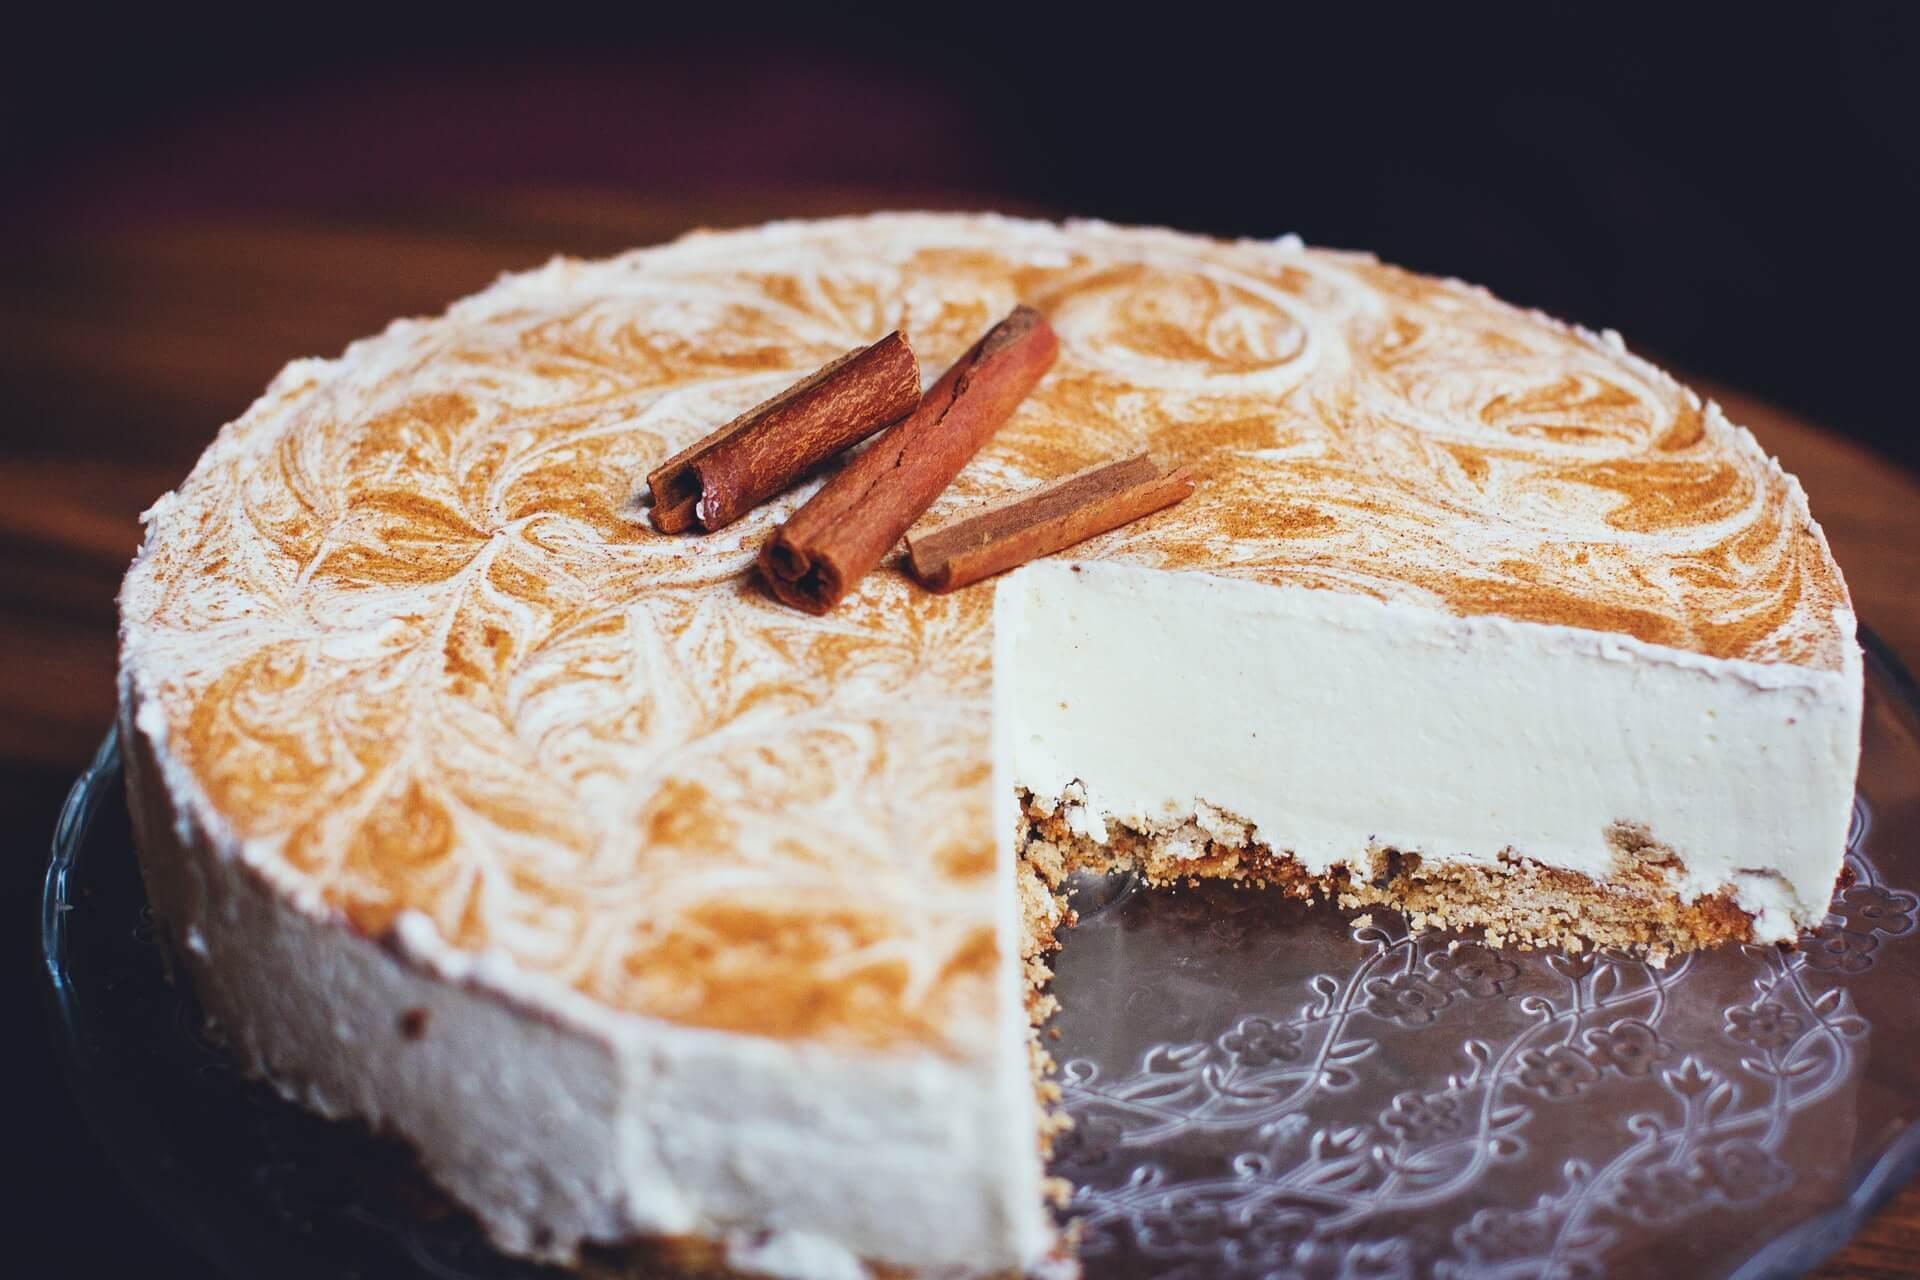 Best way to ice a vanilla cake